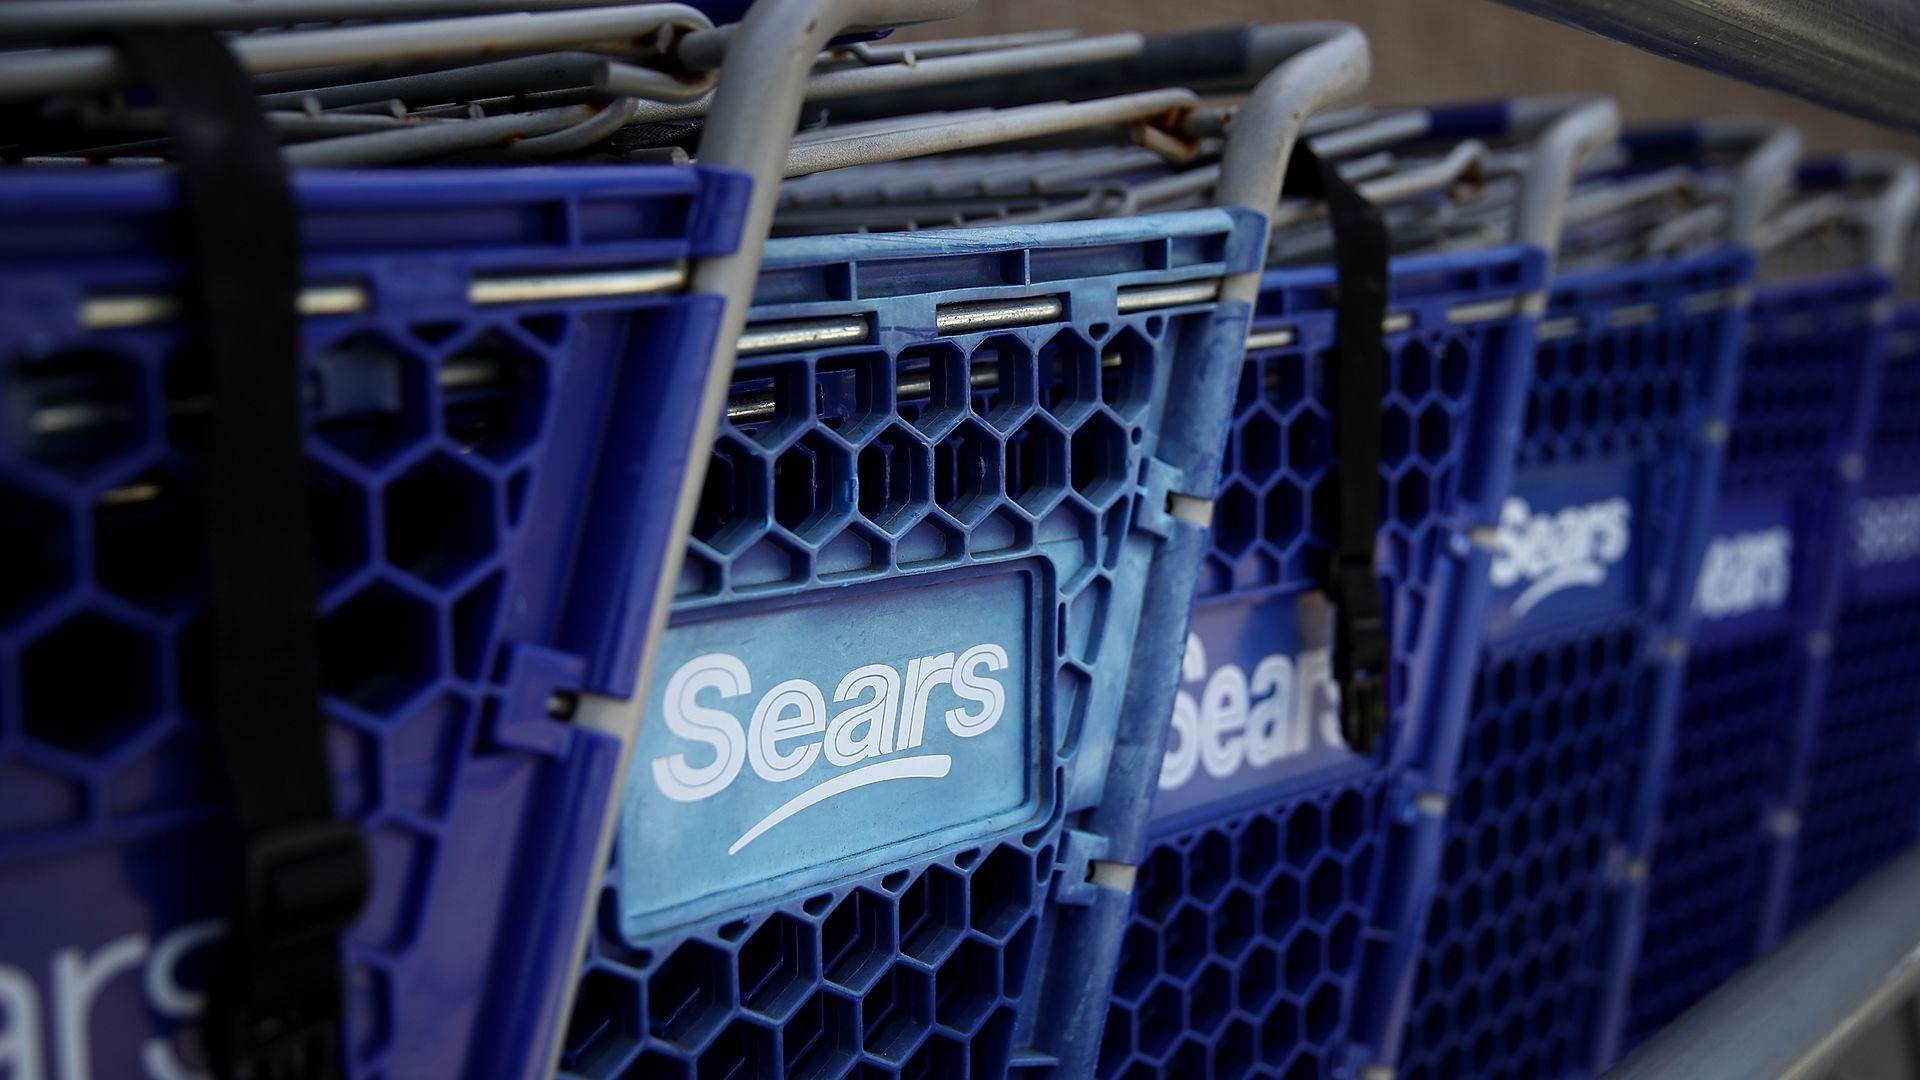 Sears logo on cart.